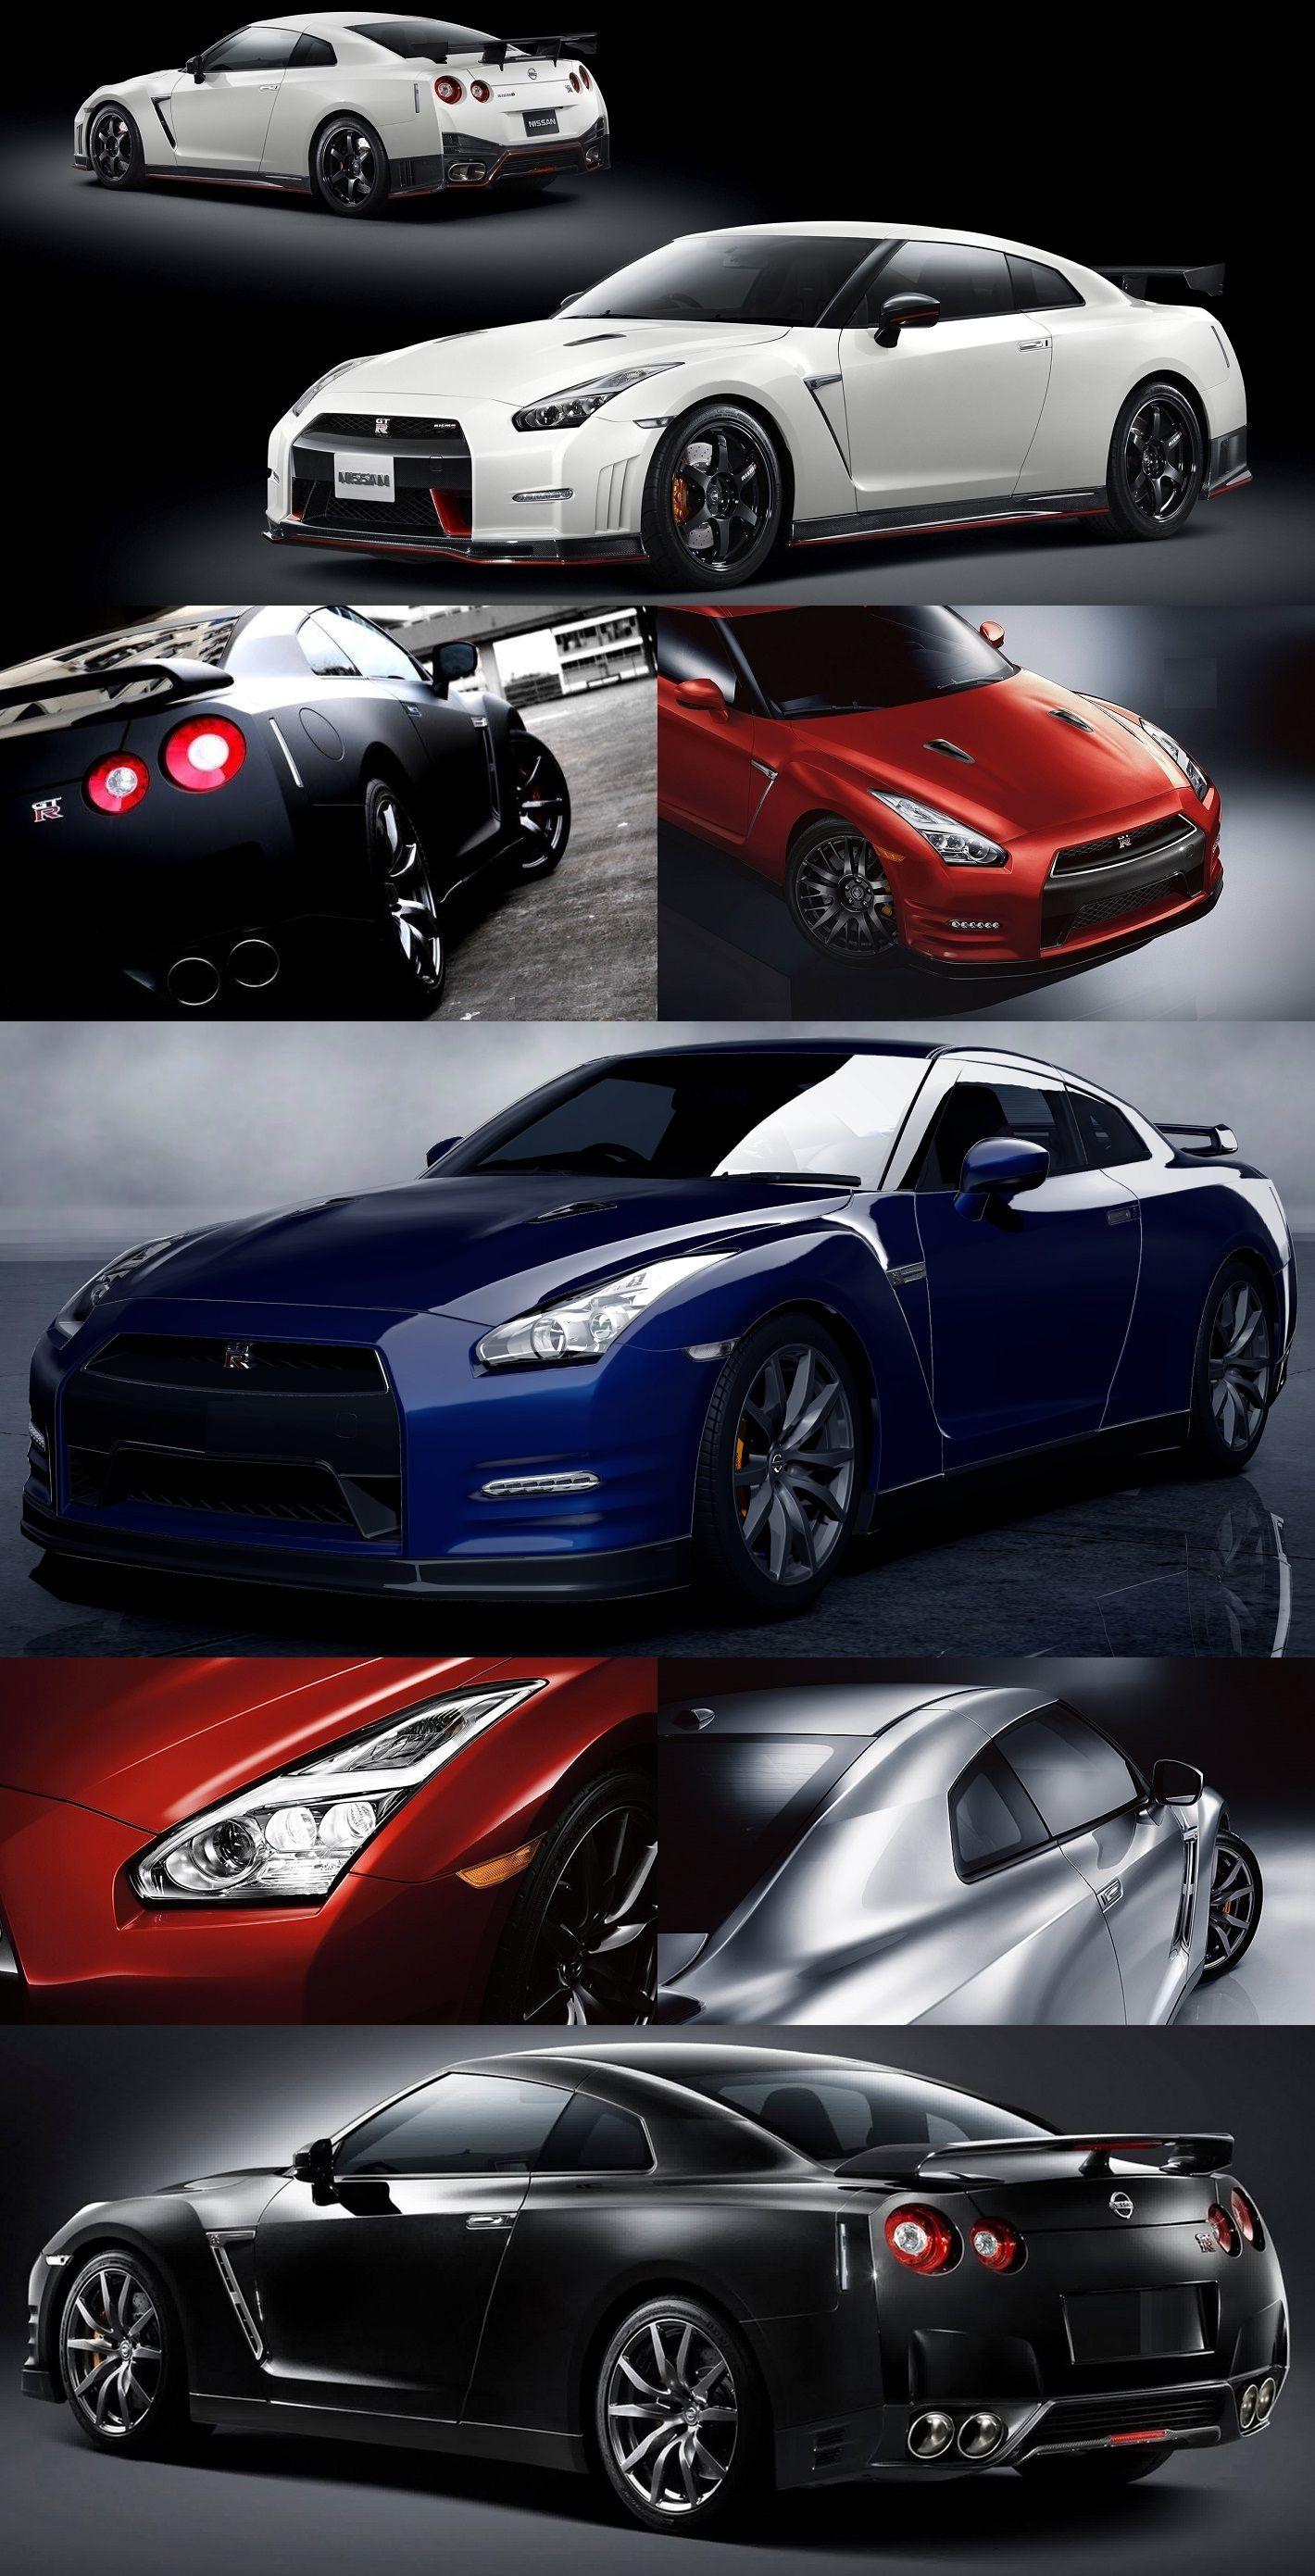 Nissan nissan deportivos nissan gt r nissan gt r r35 tuning cars - Godzilla The Nissan Gtr Super Car